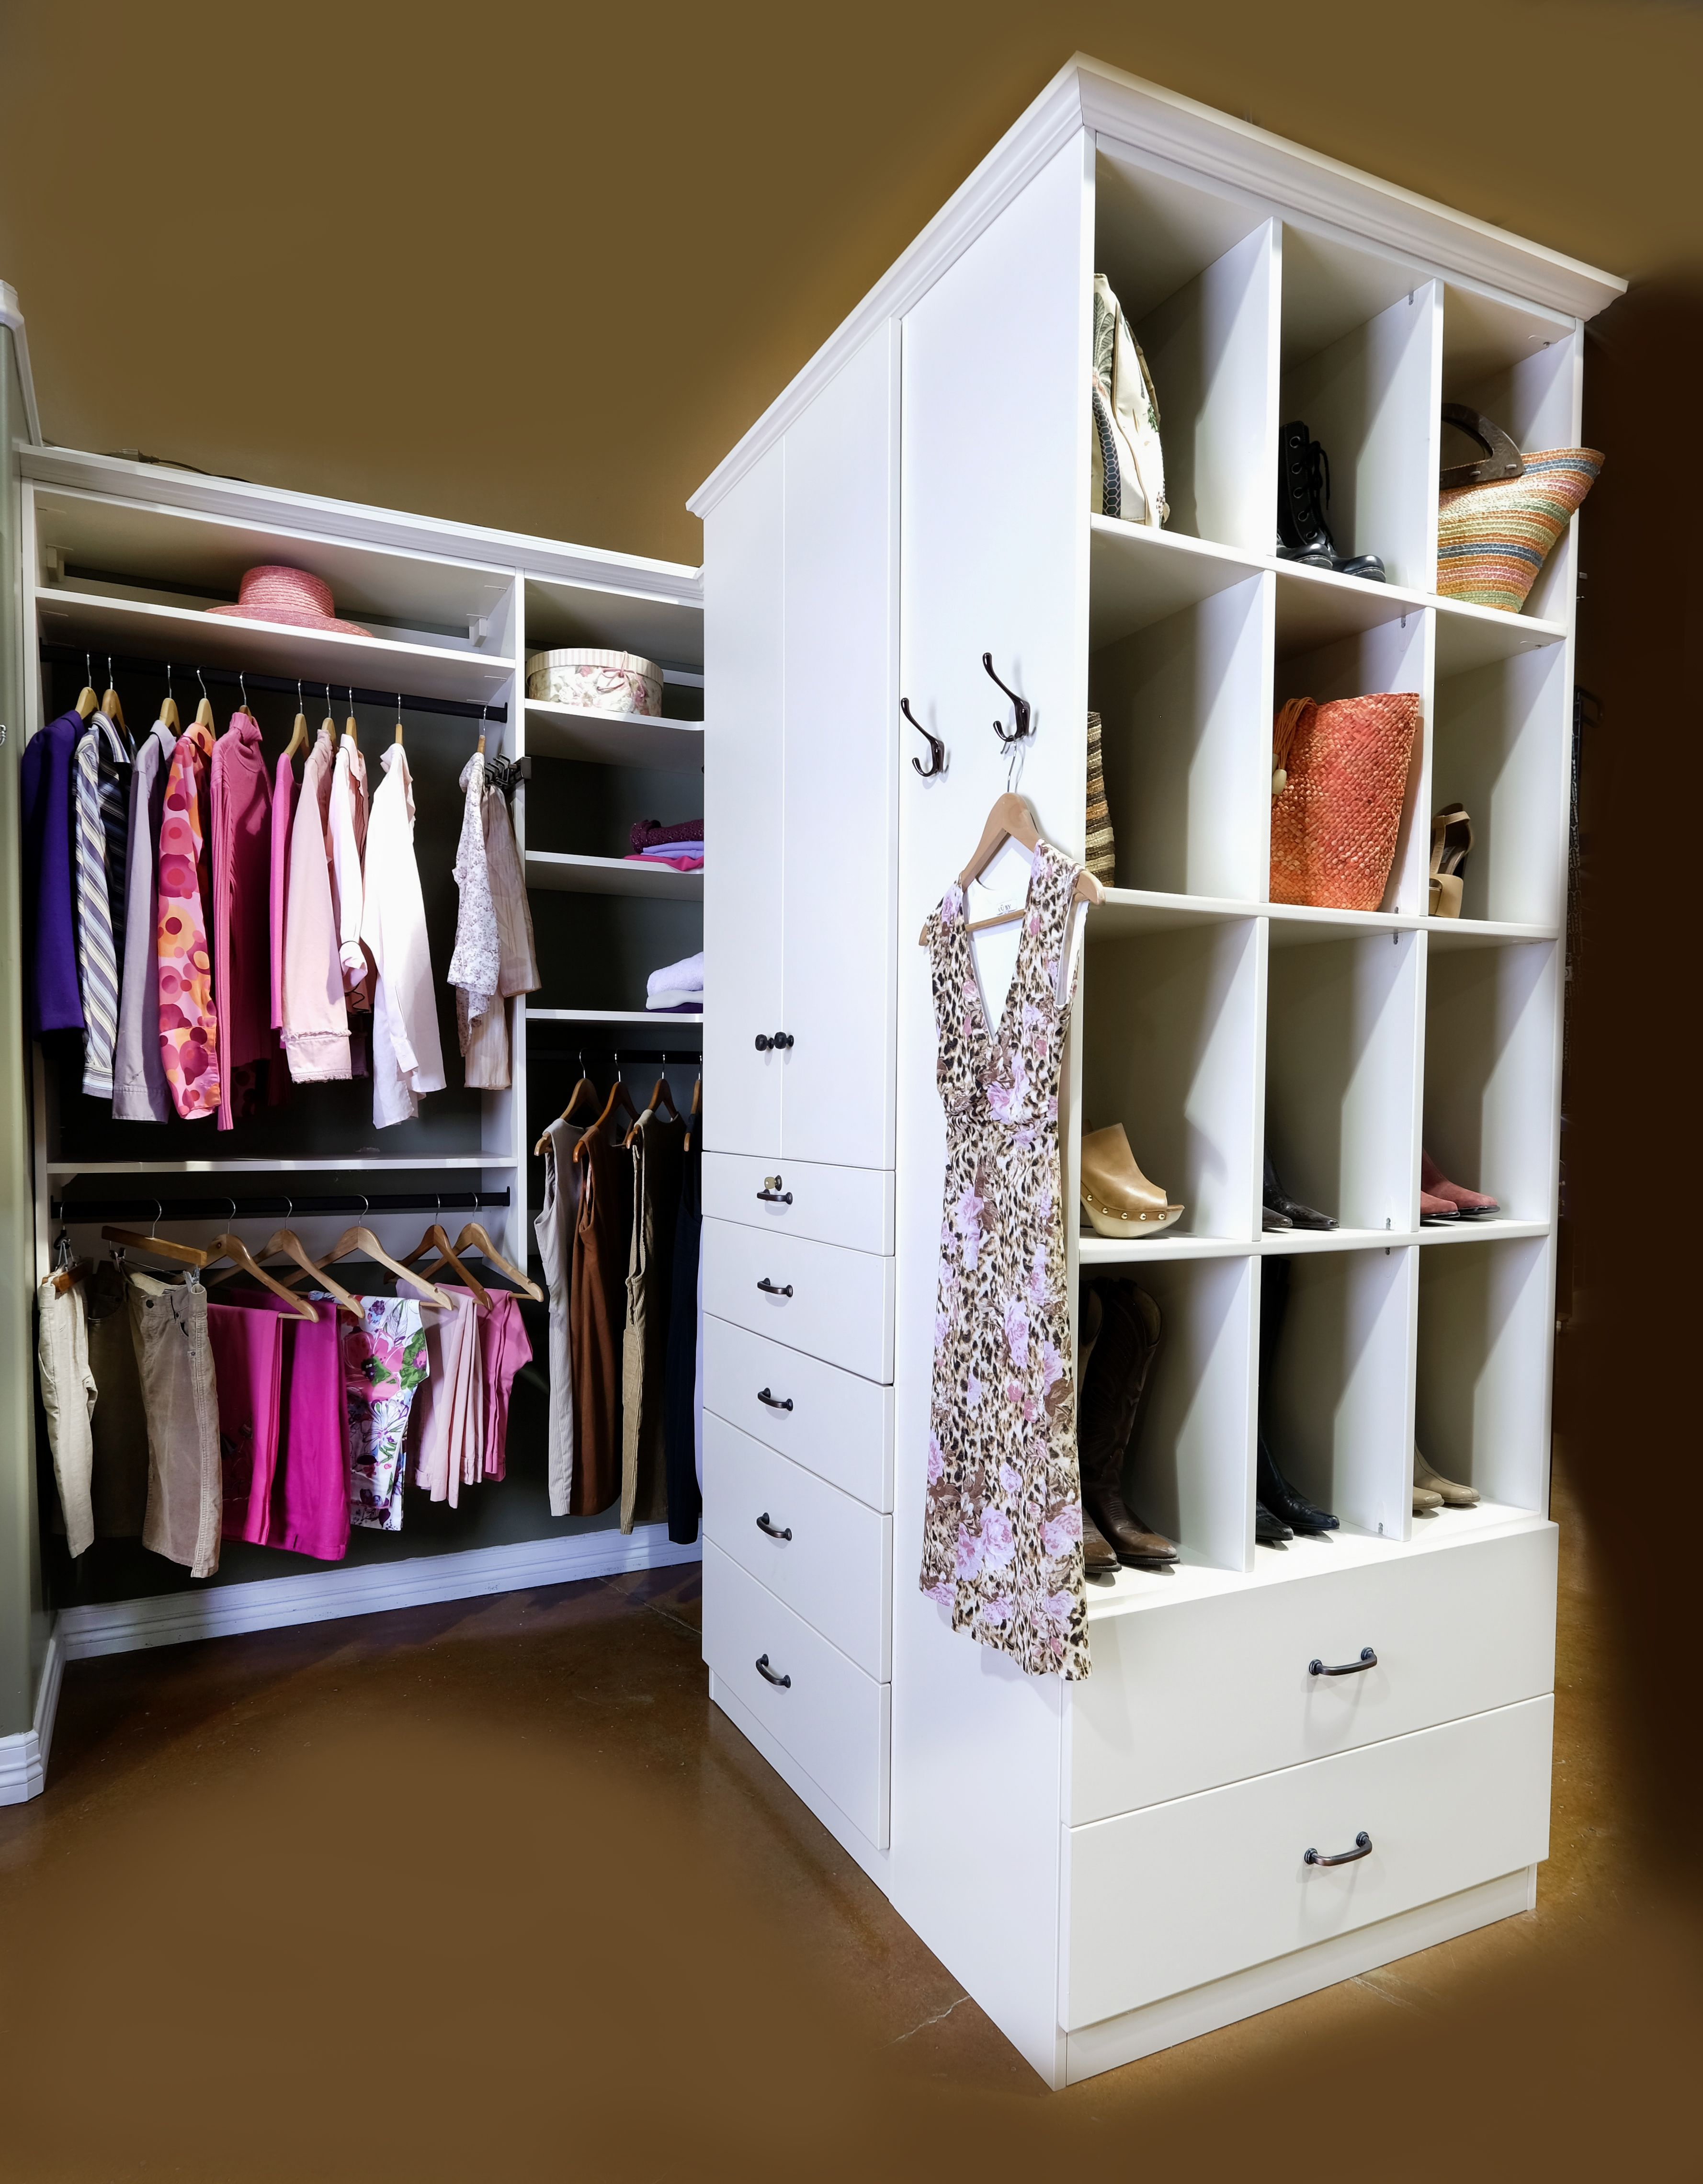 Pin By Closets To Go On Custom Closet Organizers Closet Designs